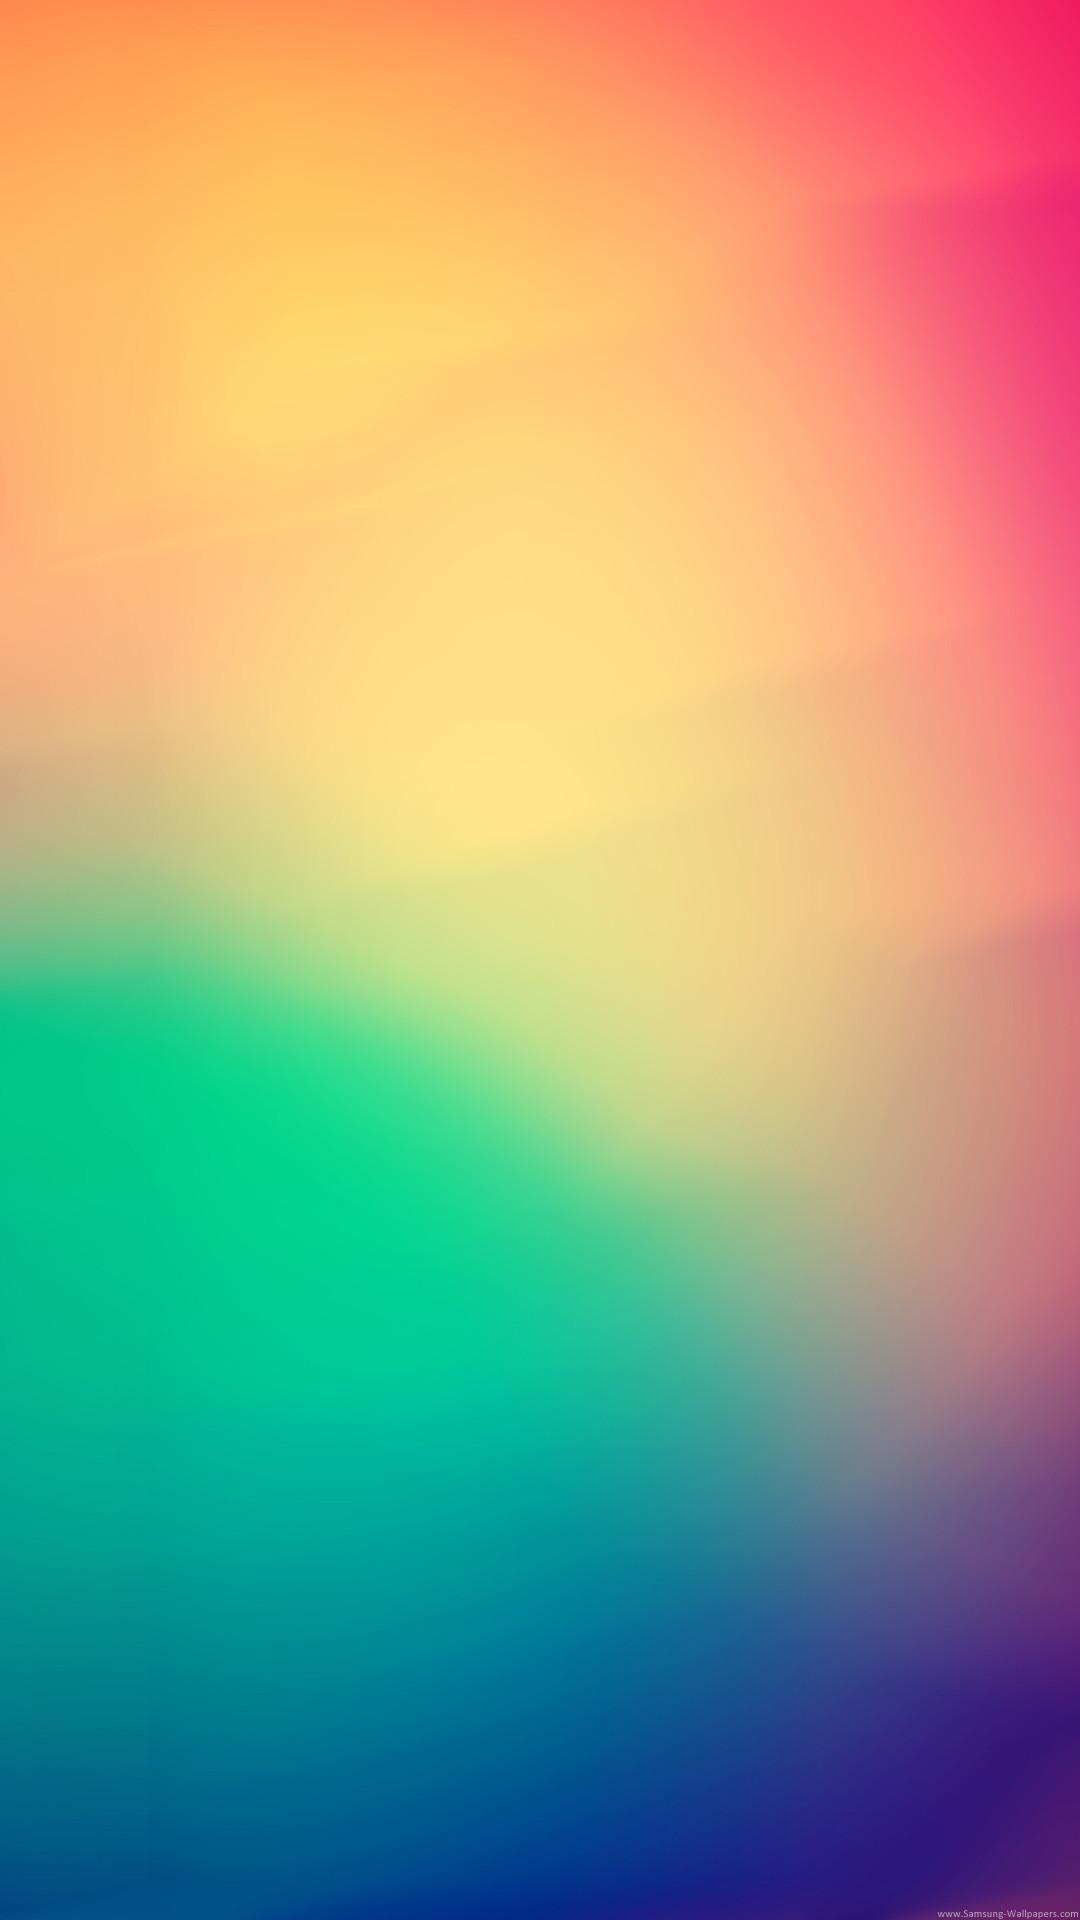 Original iOS 4 Wallpapers (67+ images)